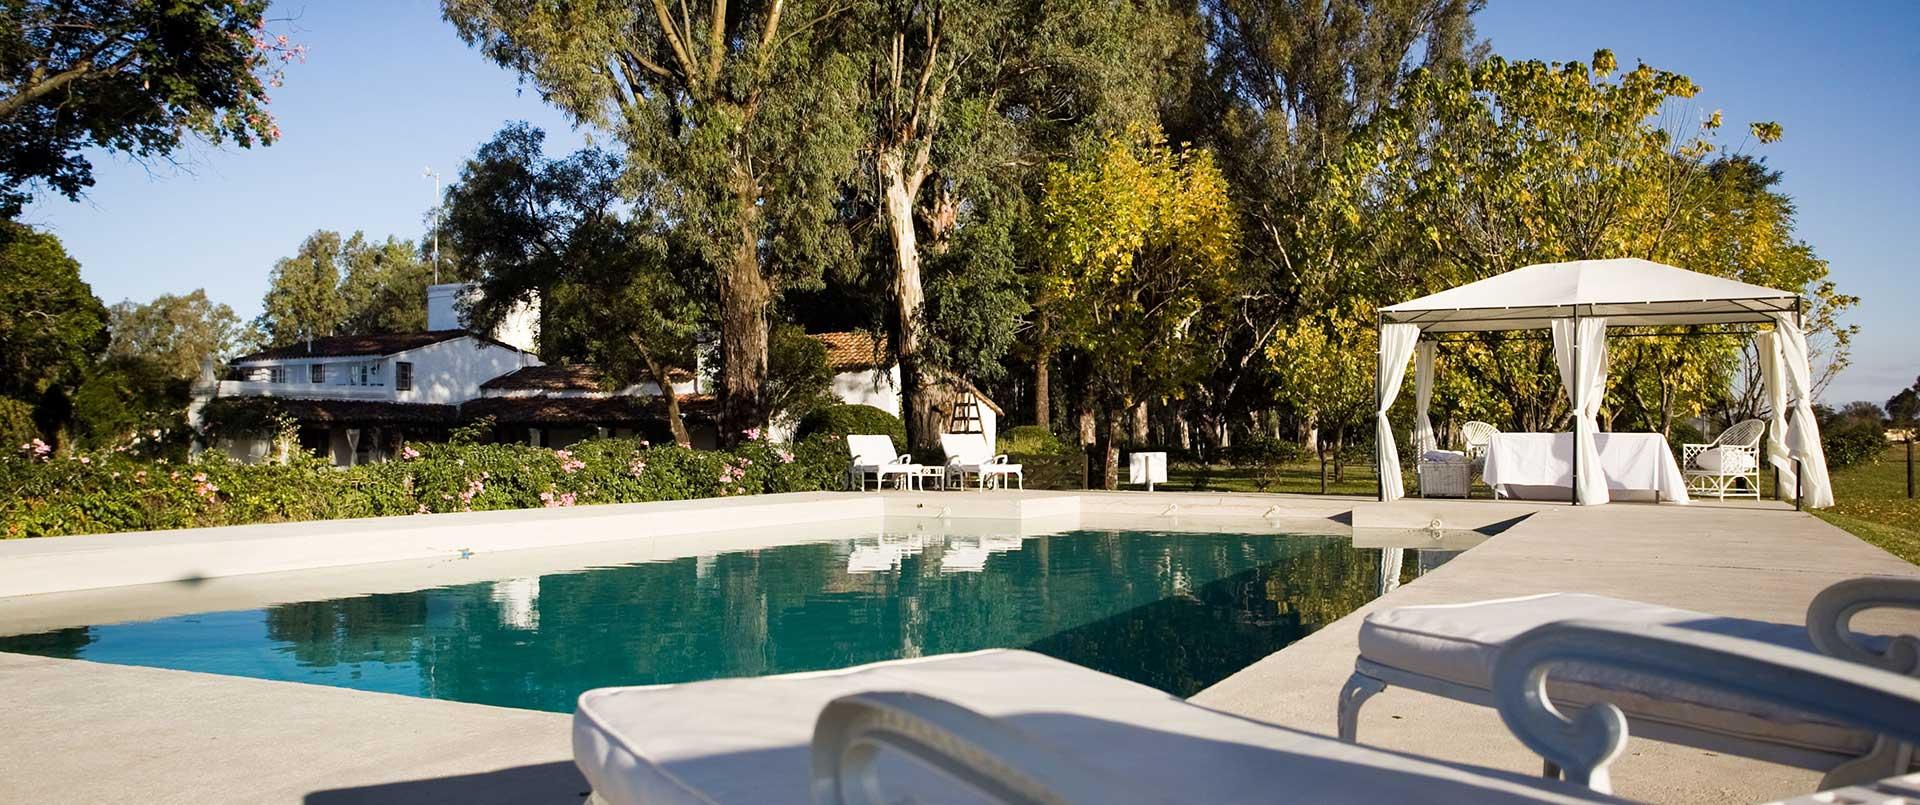 House of Jasmines, Salta, North-west Argentina